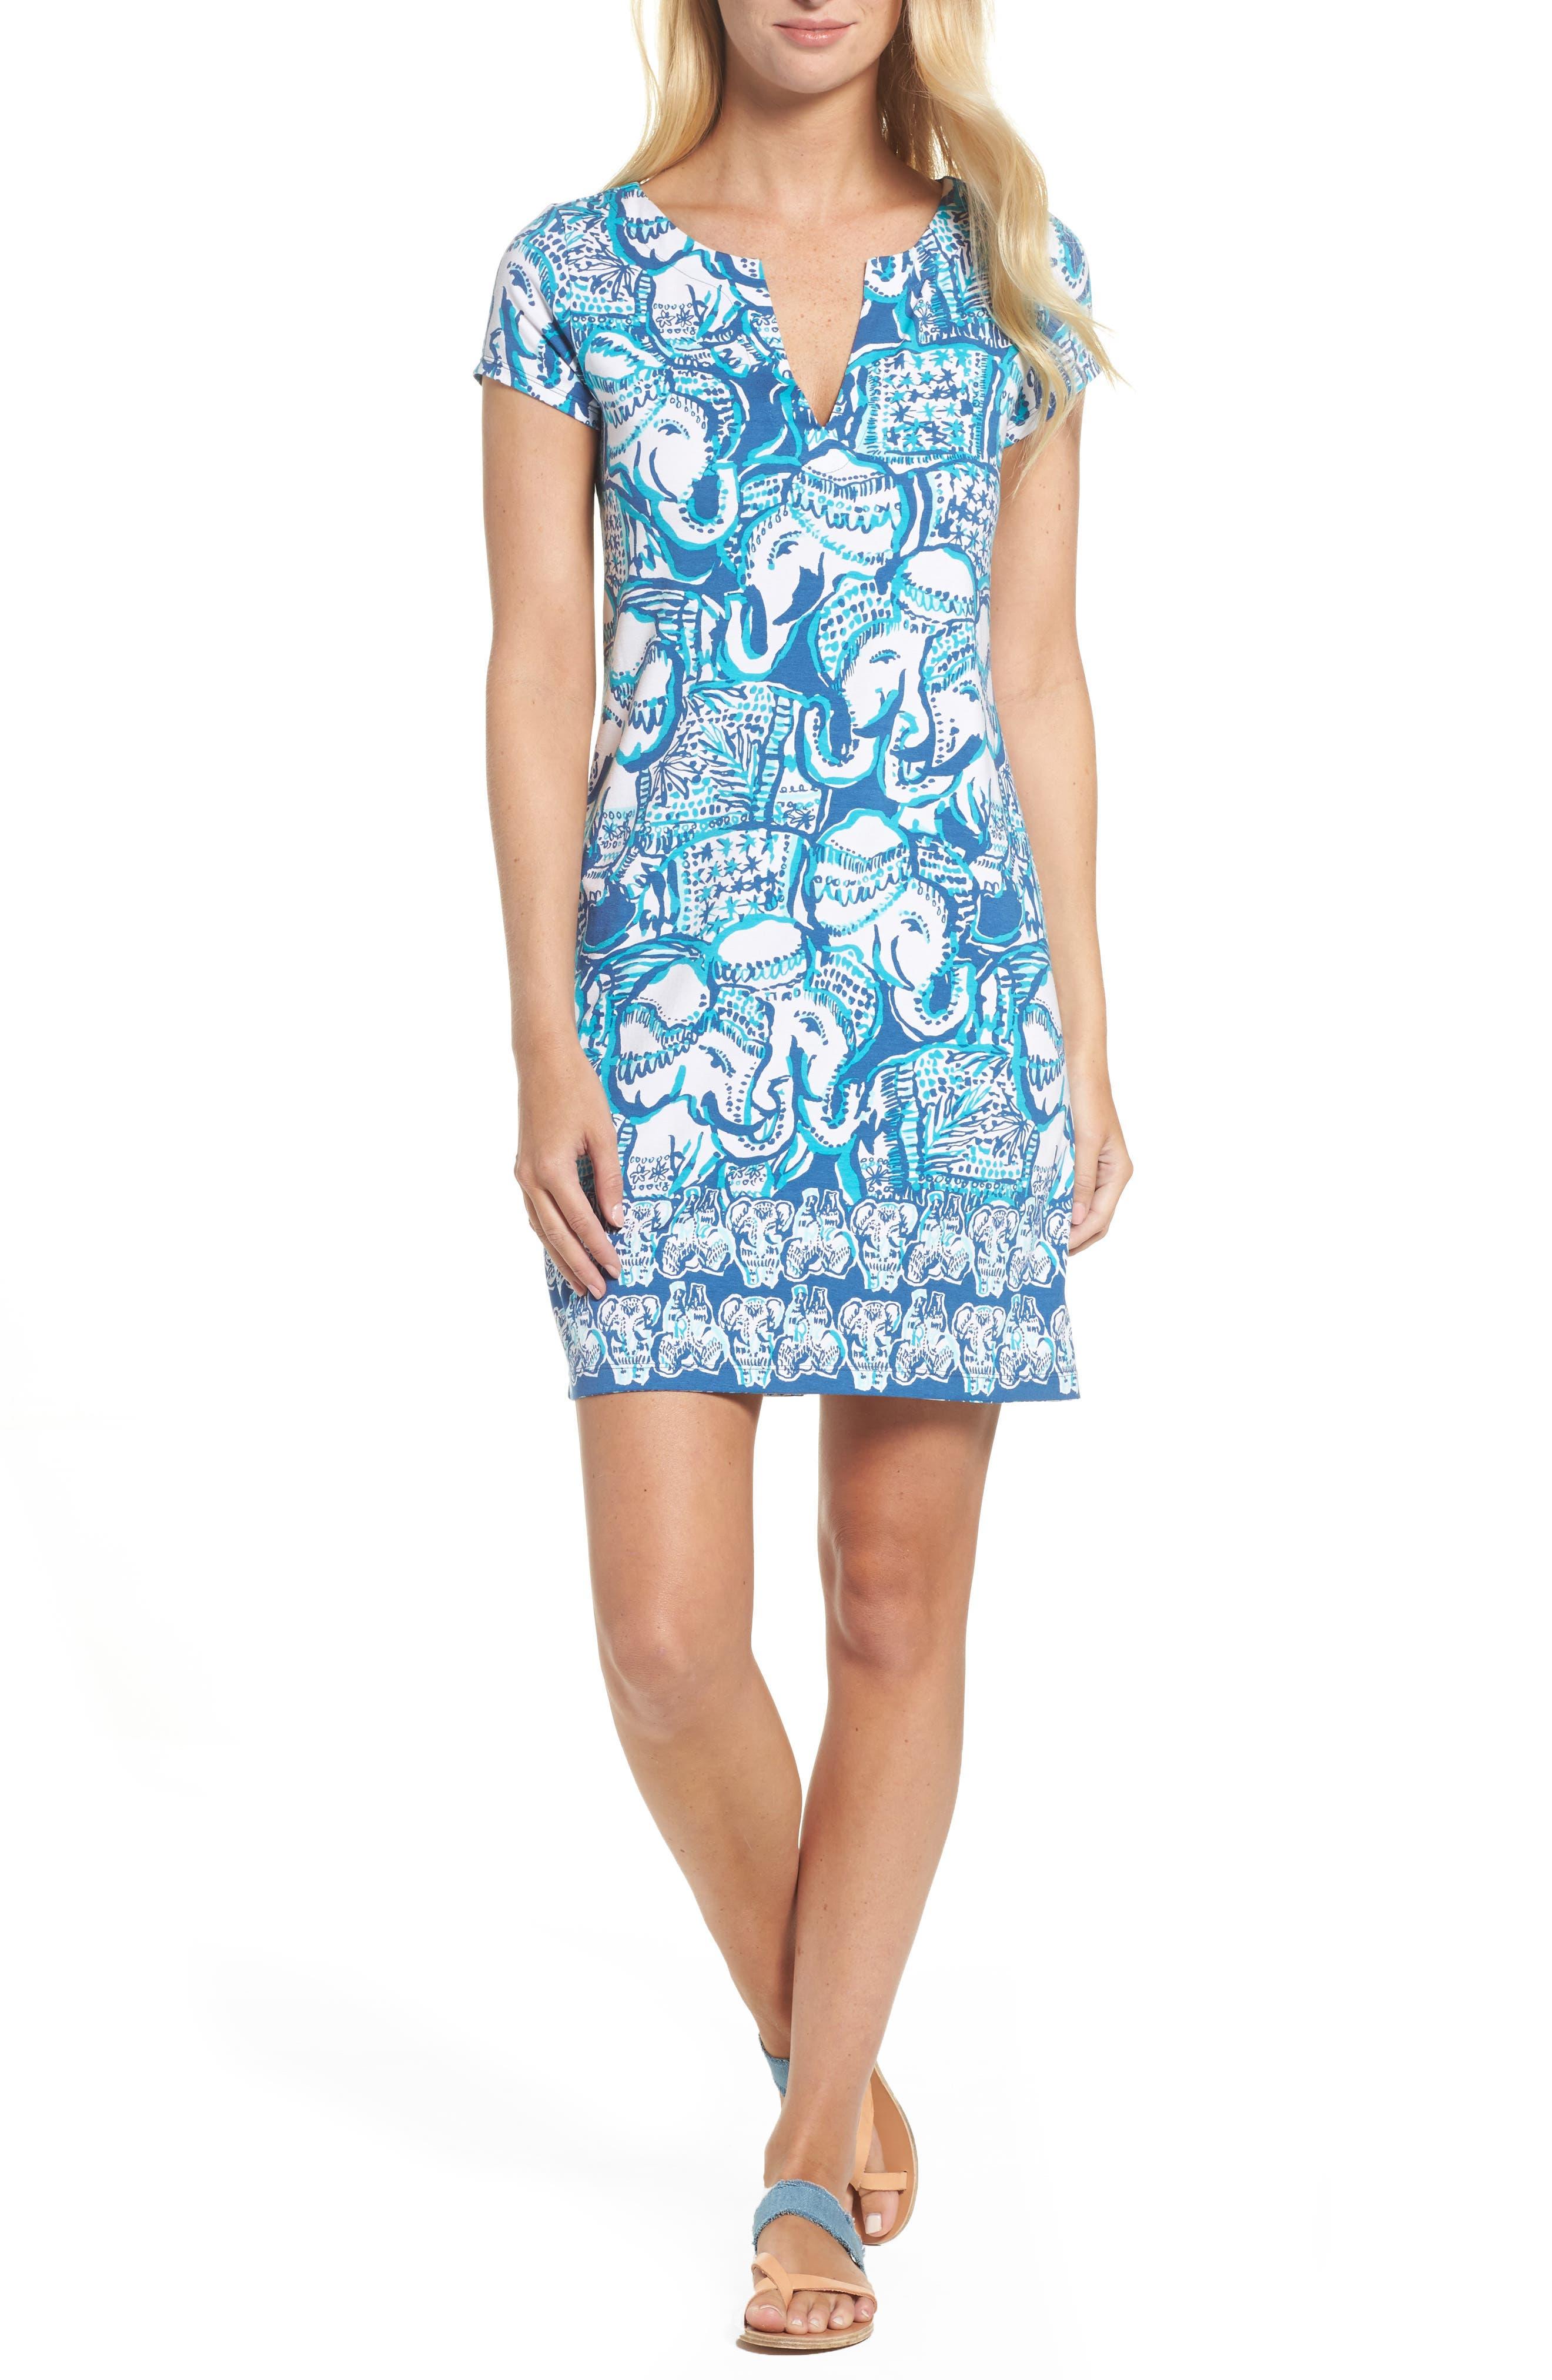 Main Image - Lilly Pulitzer® Sophiletta UPF 50+ Dress